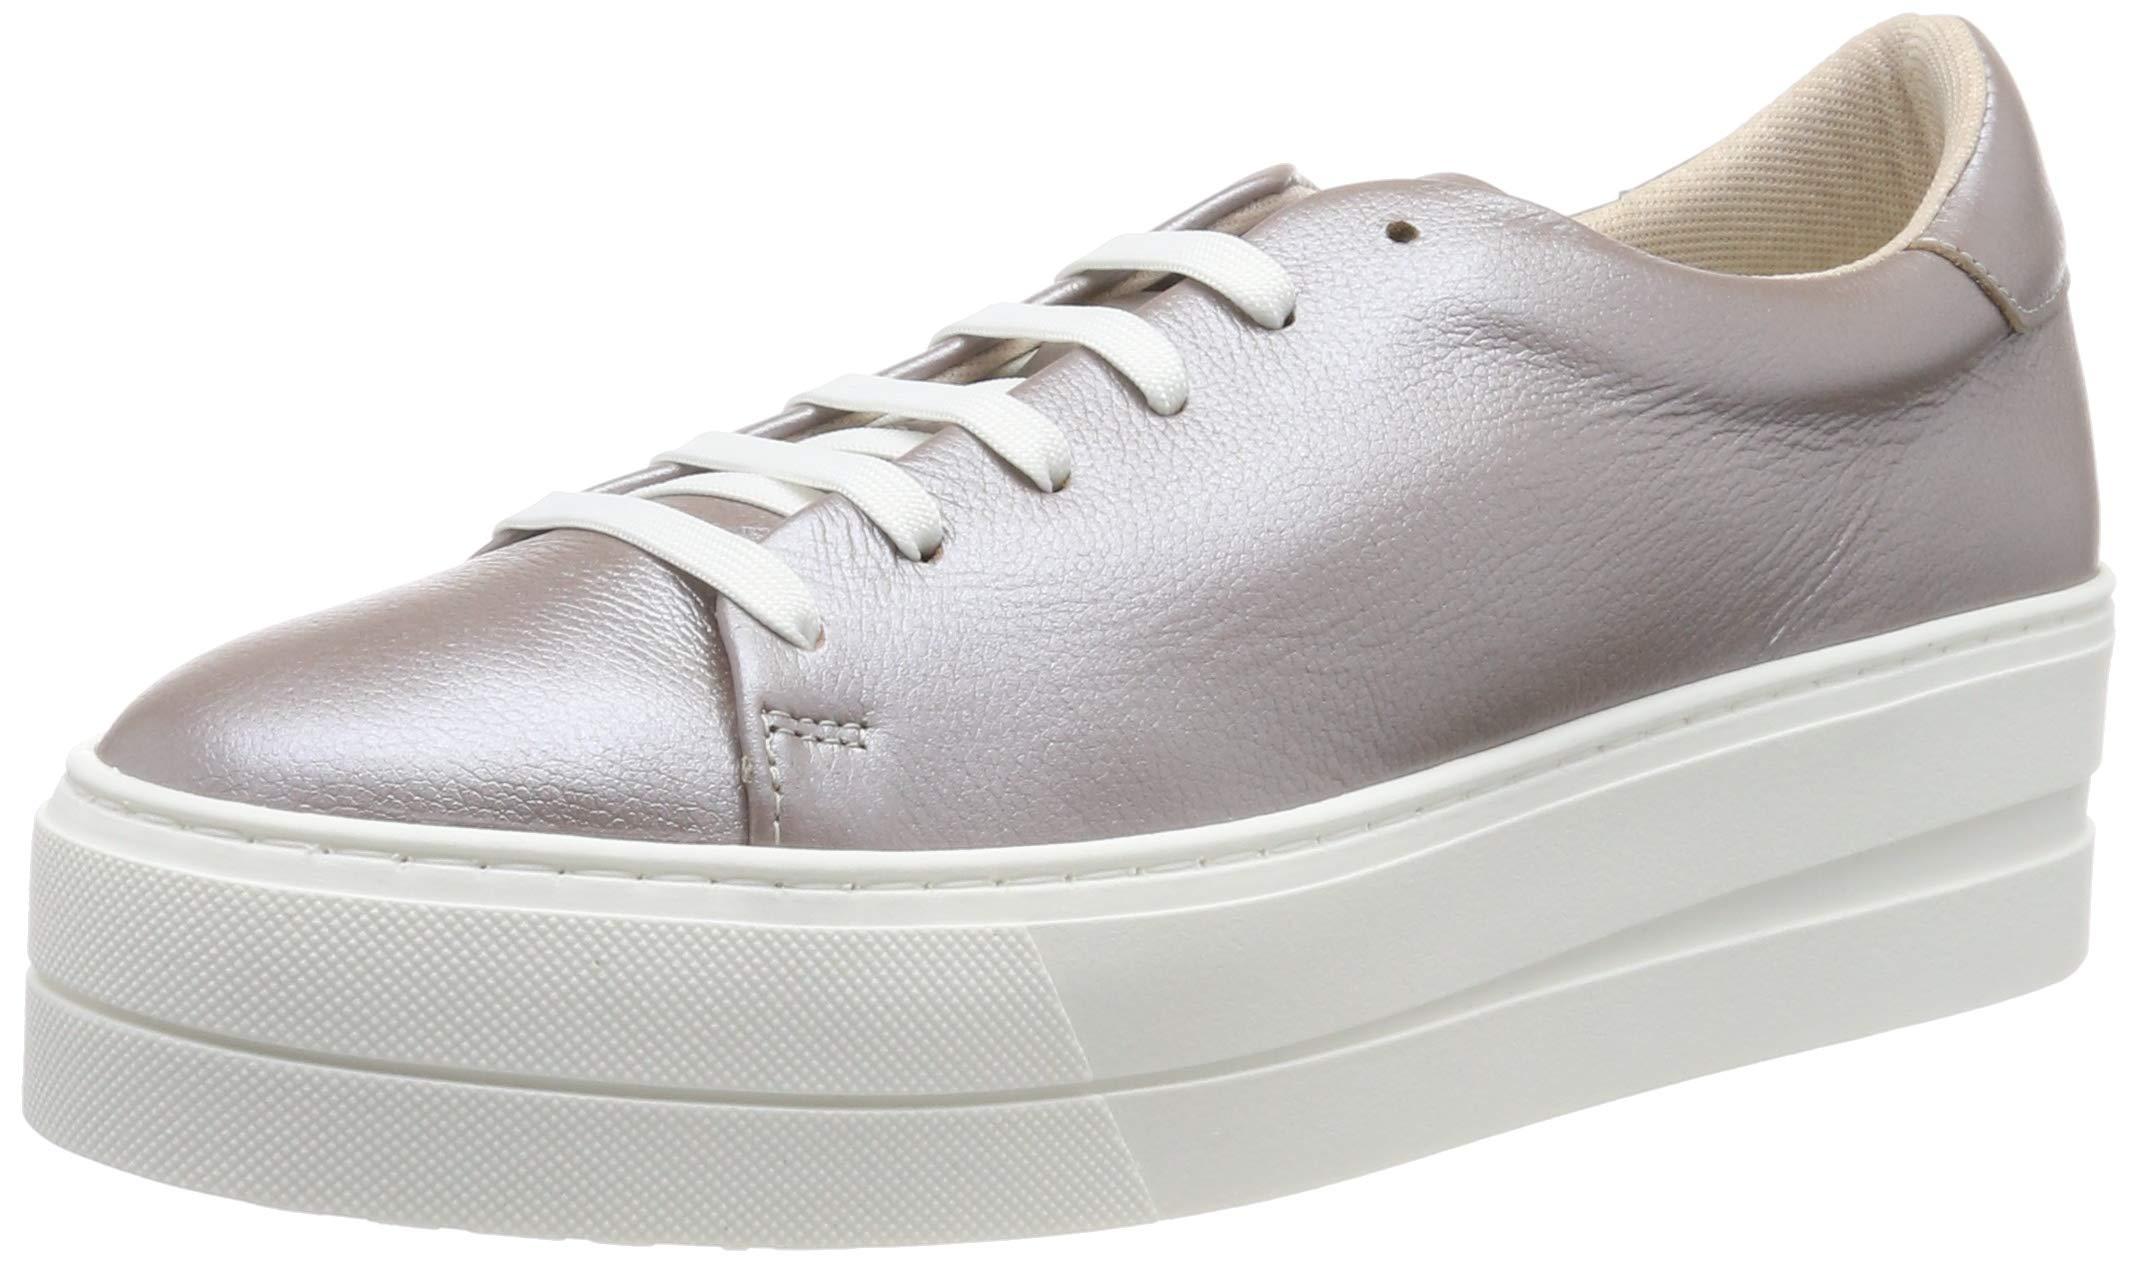 39840 Tamaris 32Sneakers FemmeBeigetaupe 1 23303 Basses Metallic 1 Eu 45RjAL